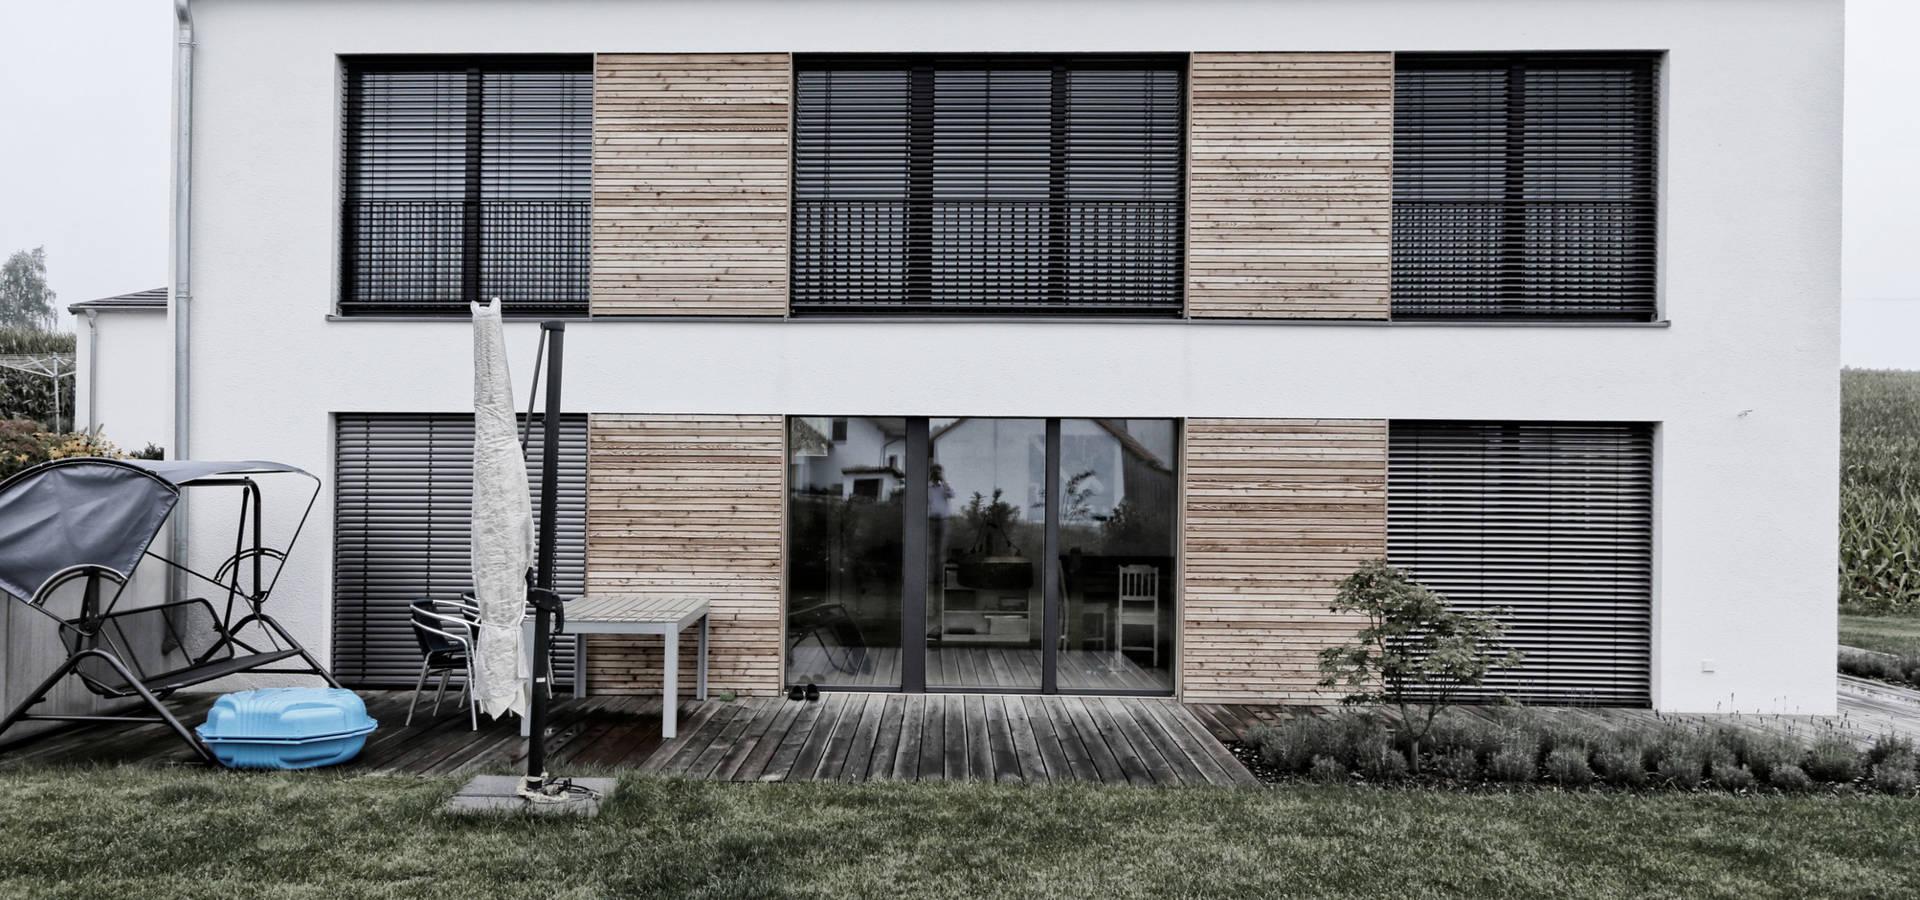 Architekt Regensburg dirk ströhle a r c h i t e k t architekten in regensburg homify